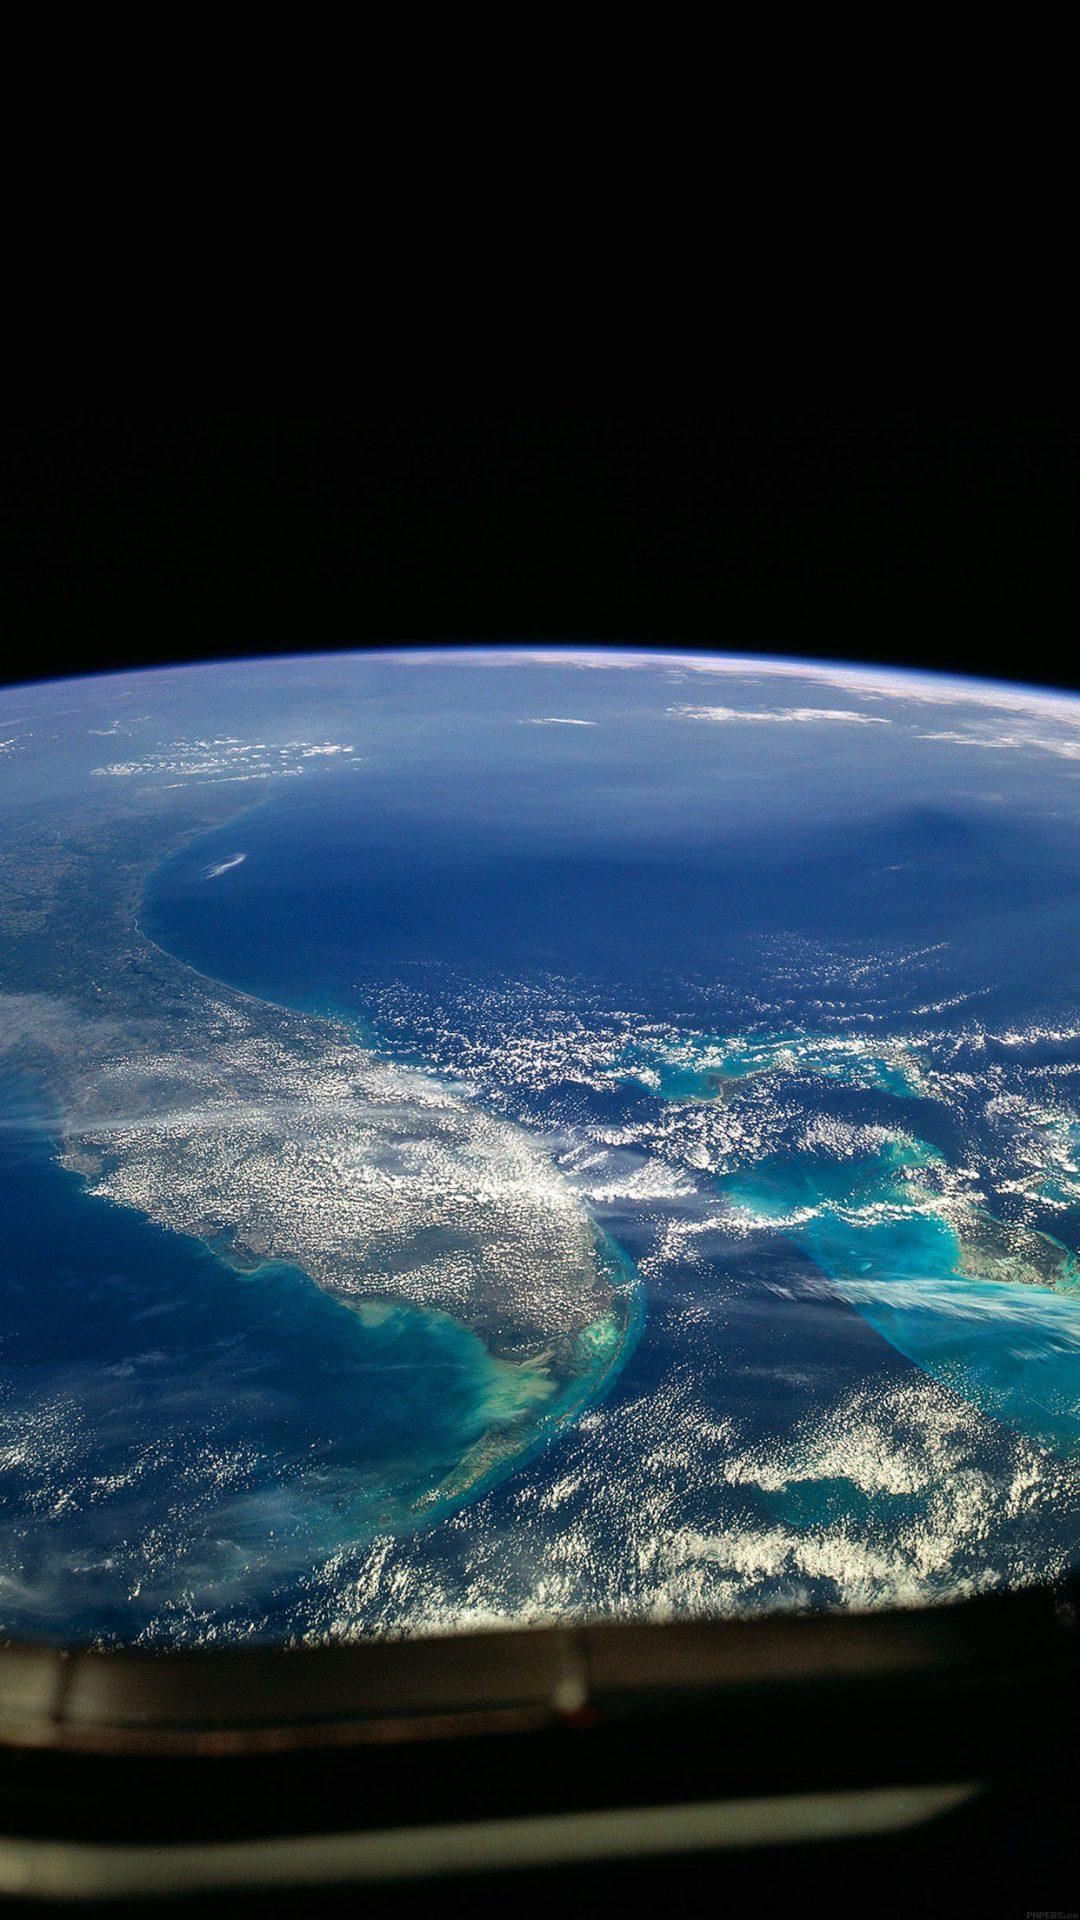 Wallpaper Alien View Of Earth Space